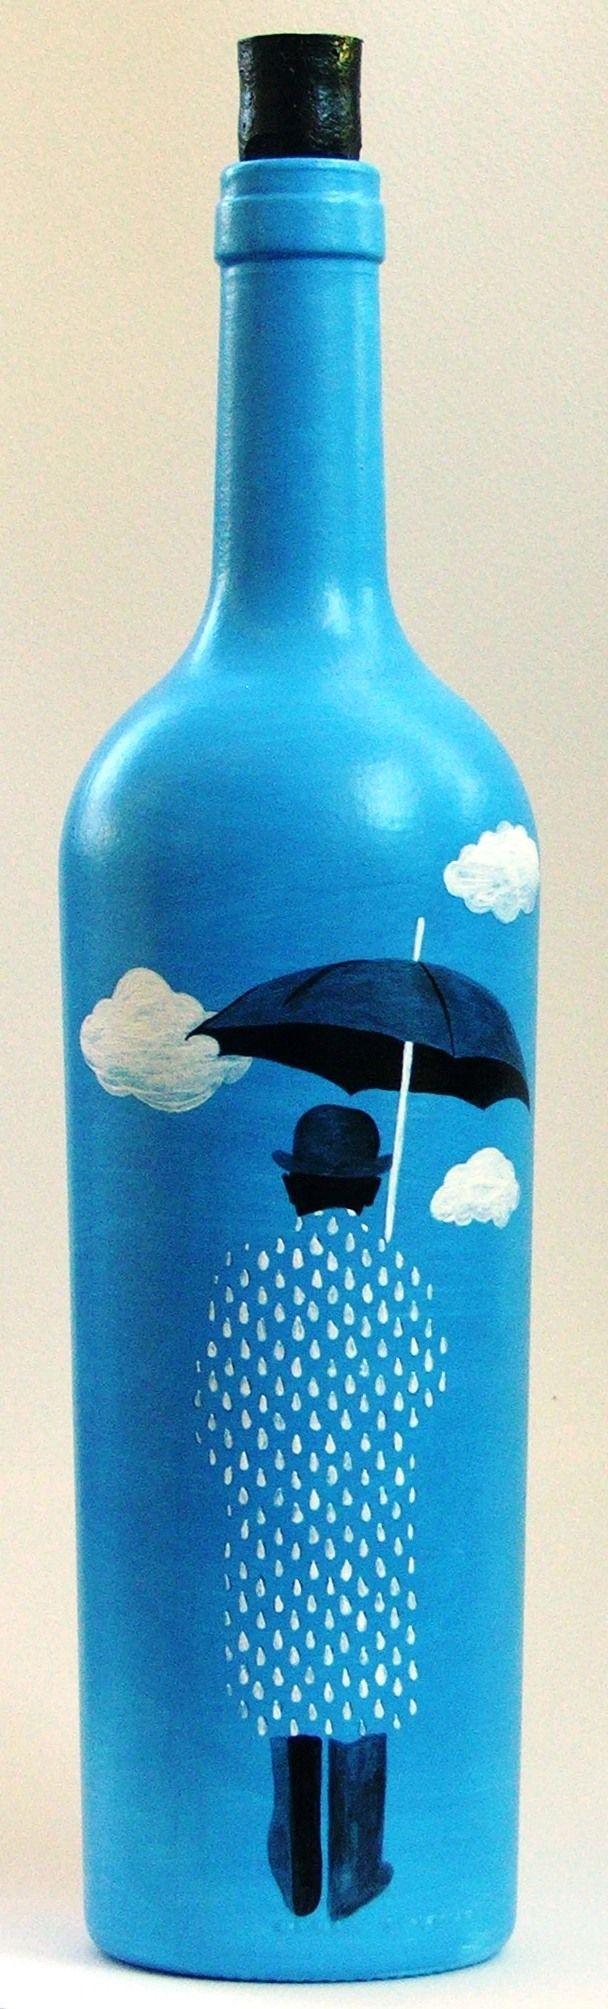 Botella pintada a mano:                                                                                                                                                                                 Más